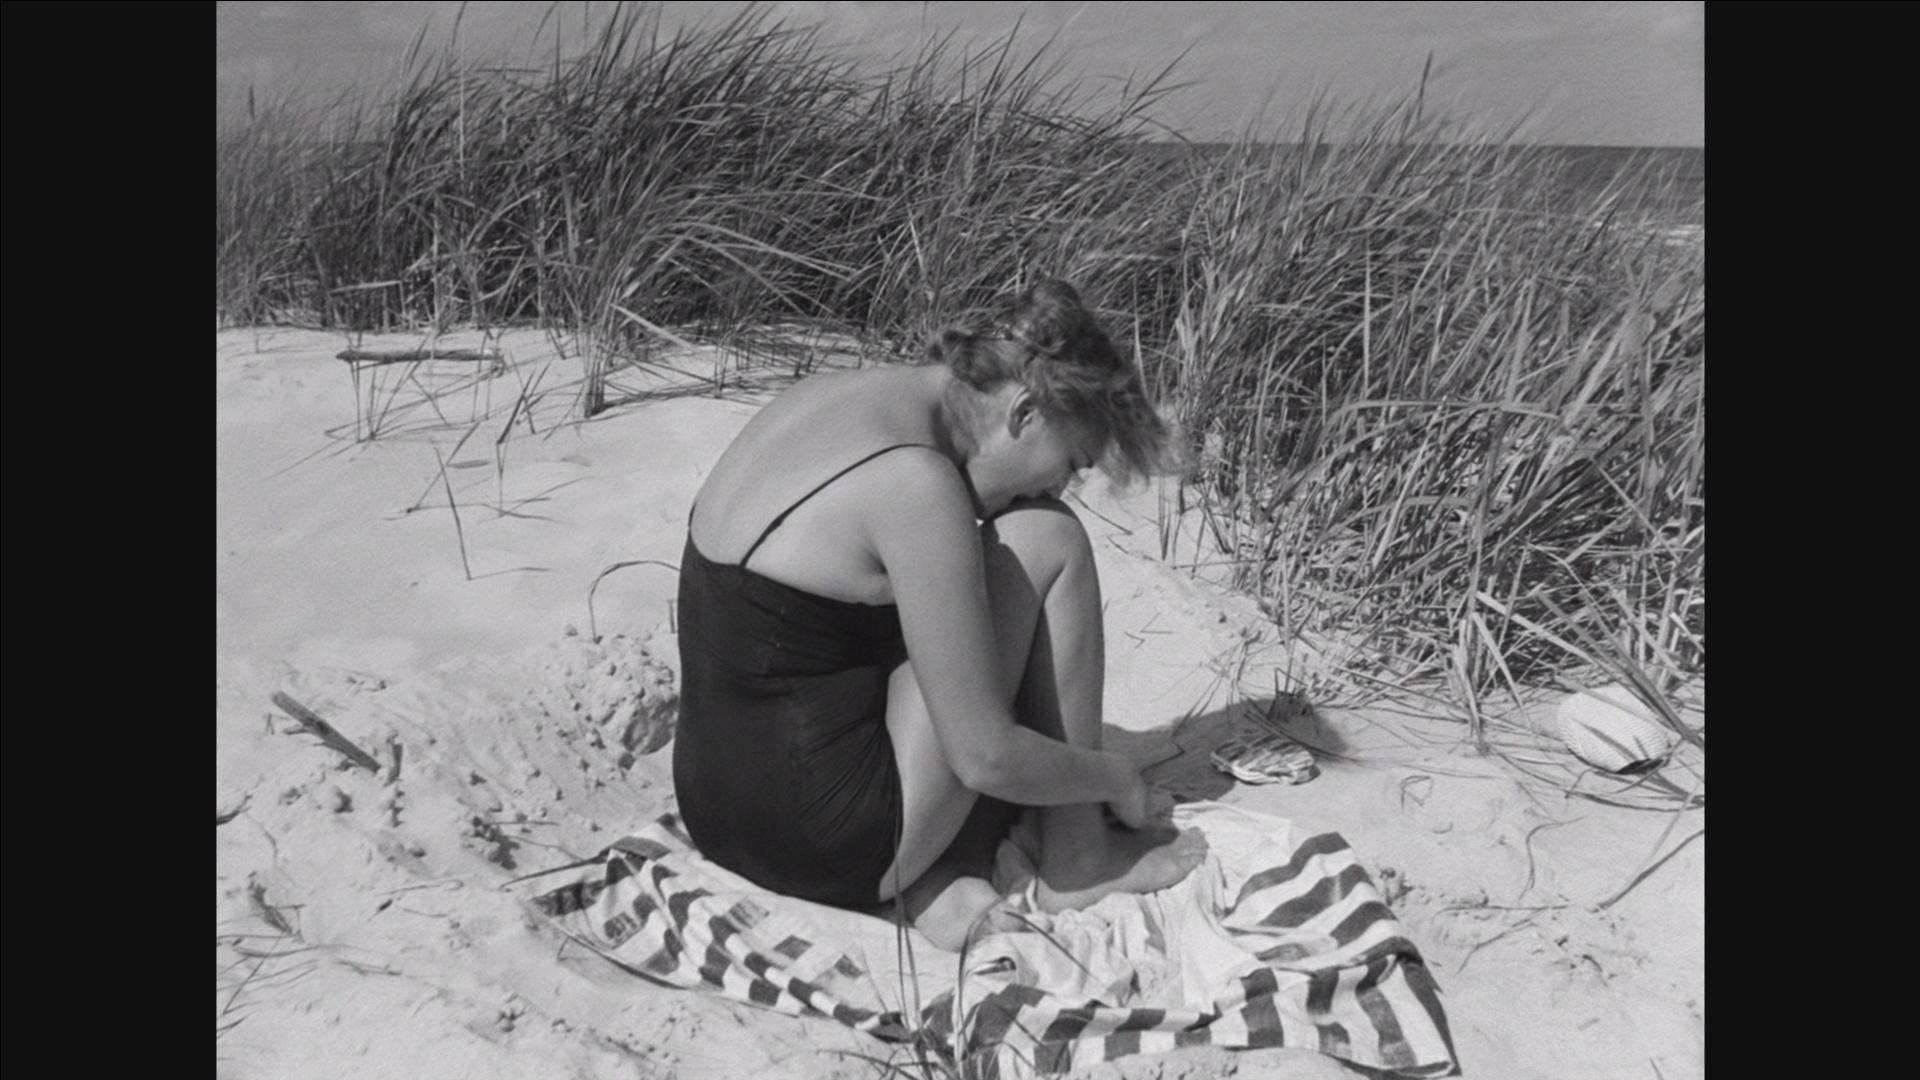 Martin Scorsese Presents: Masterpieces of Polish Cinema Volume 2. BR 3: Ostatni dzien lata / The Last Day of Summer (1958)